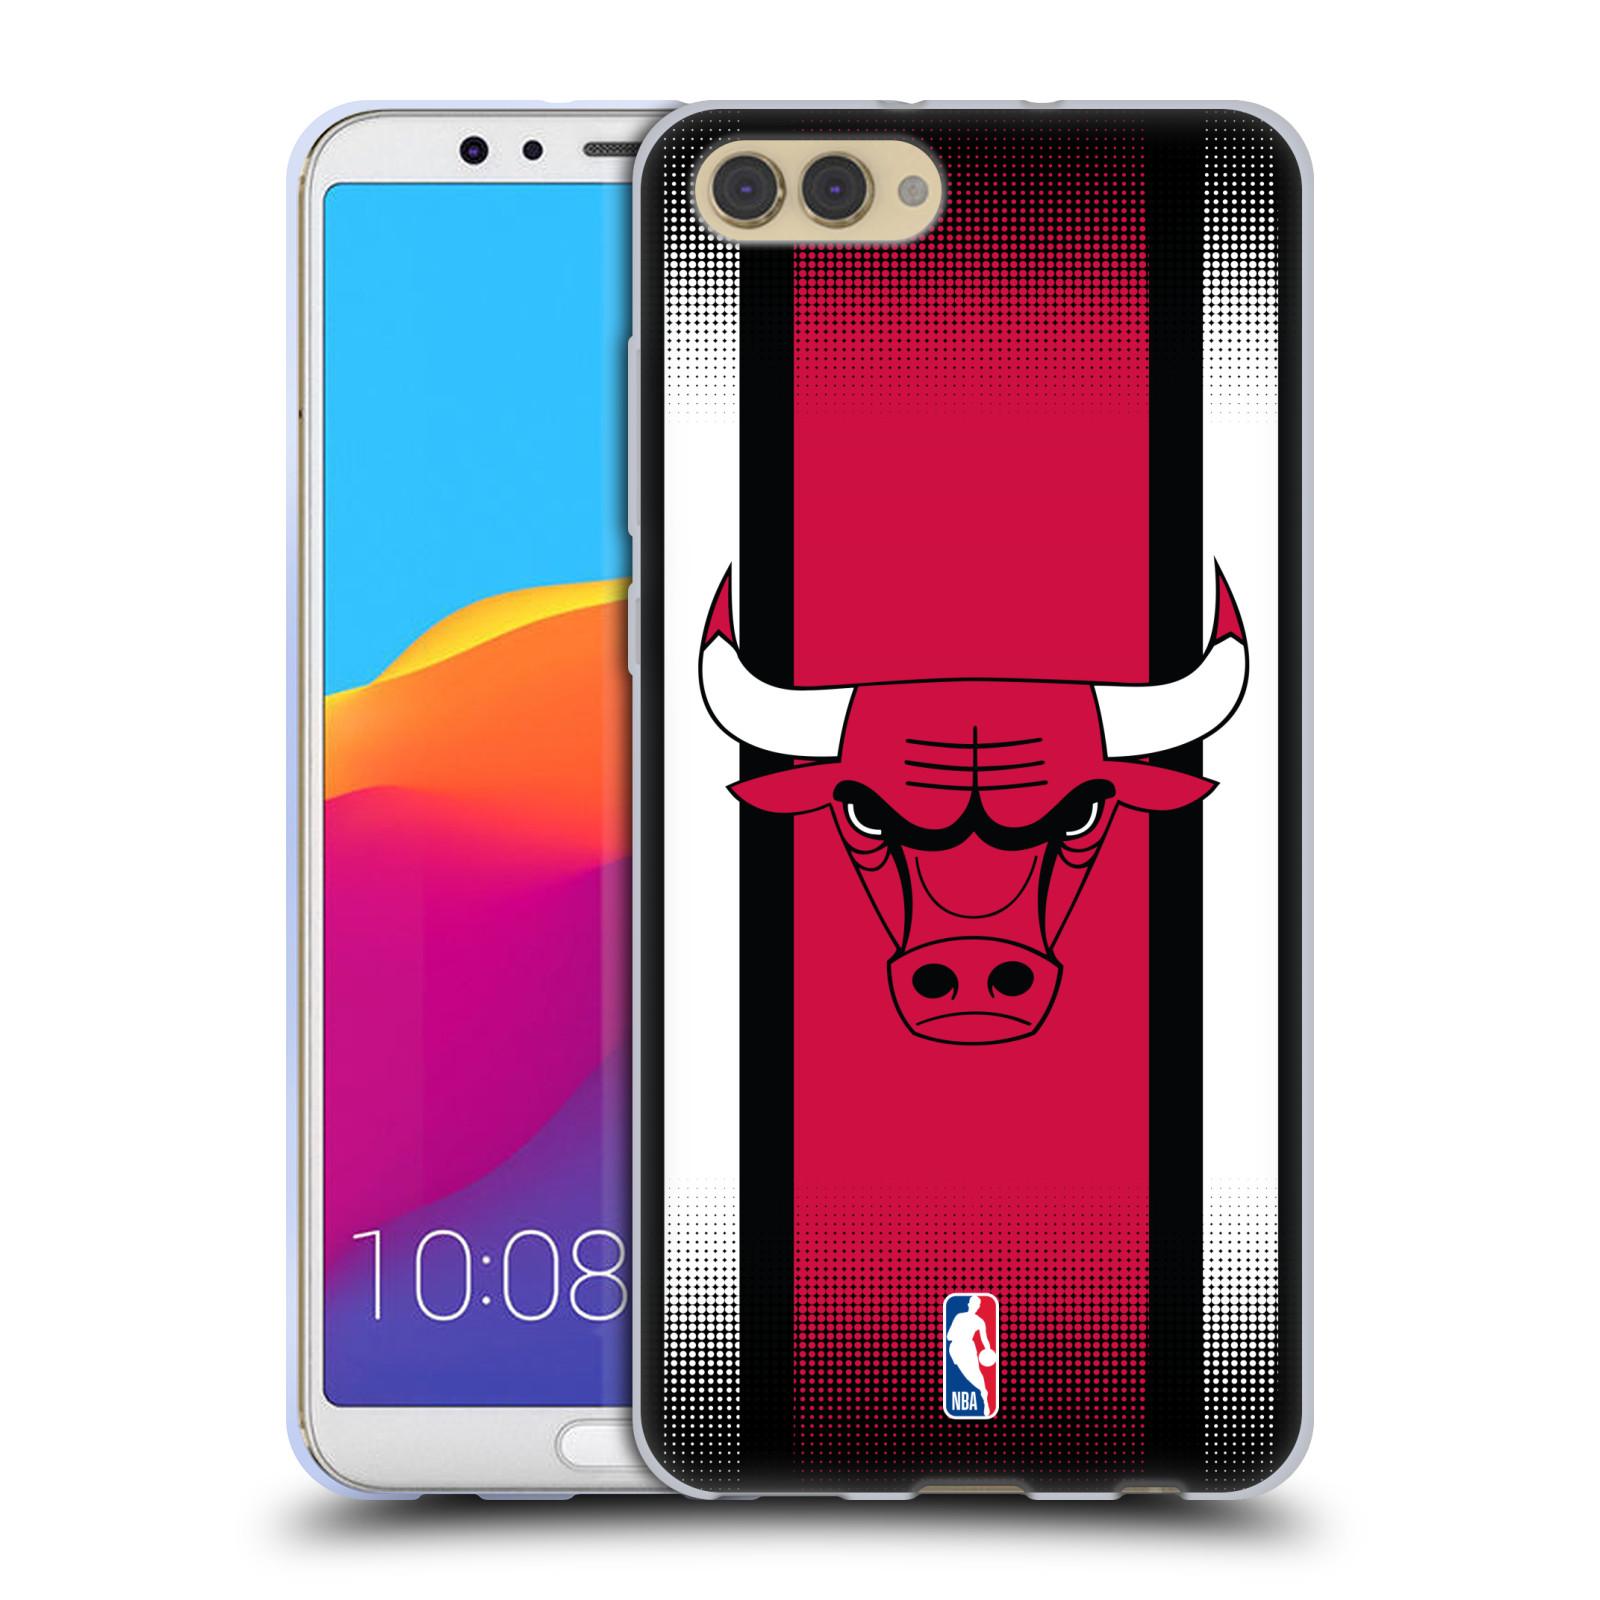 HEAD CASE silikonový obal na mobil Huawei HONOR VIEW 10 / V10 NBA Basketbalový klub Chicago Bulls logo pruhy